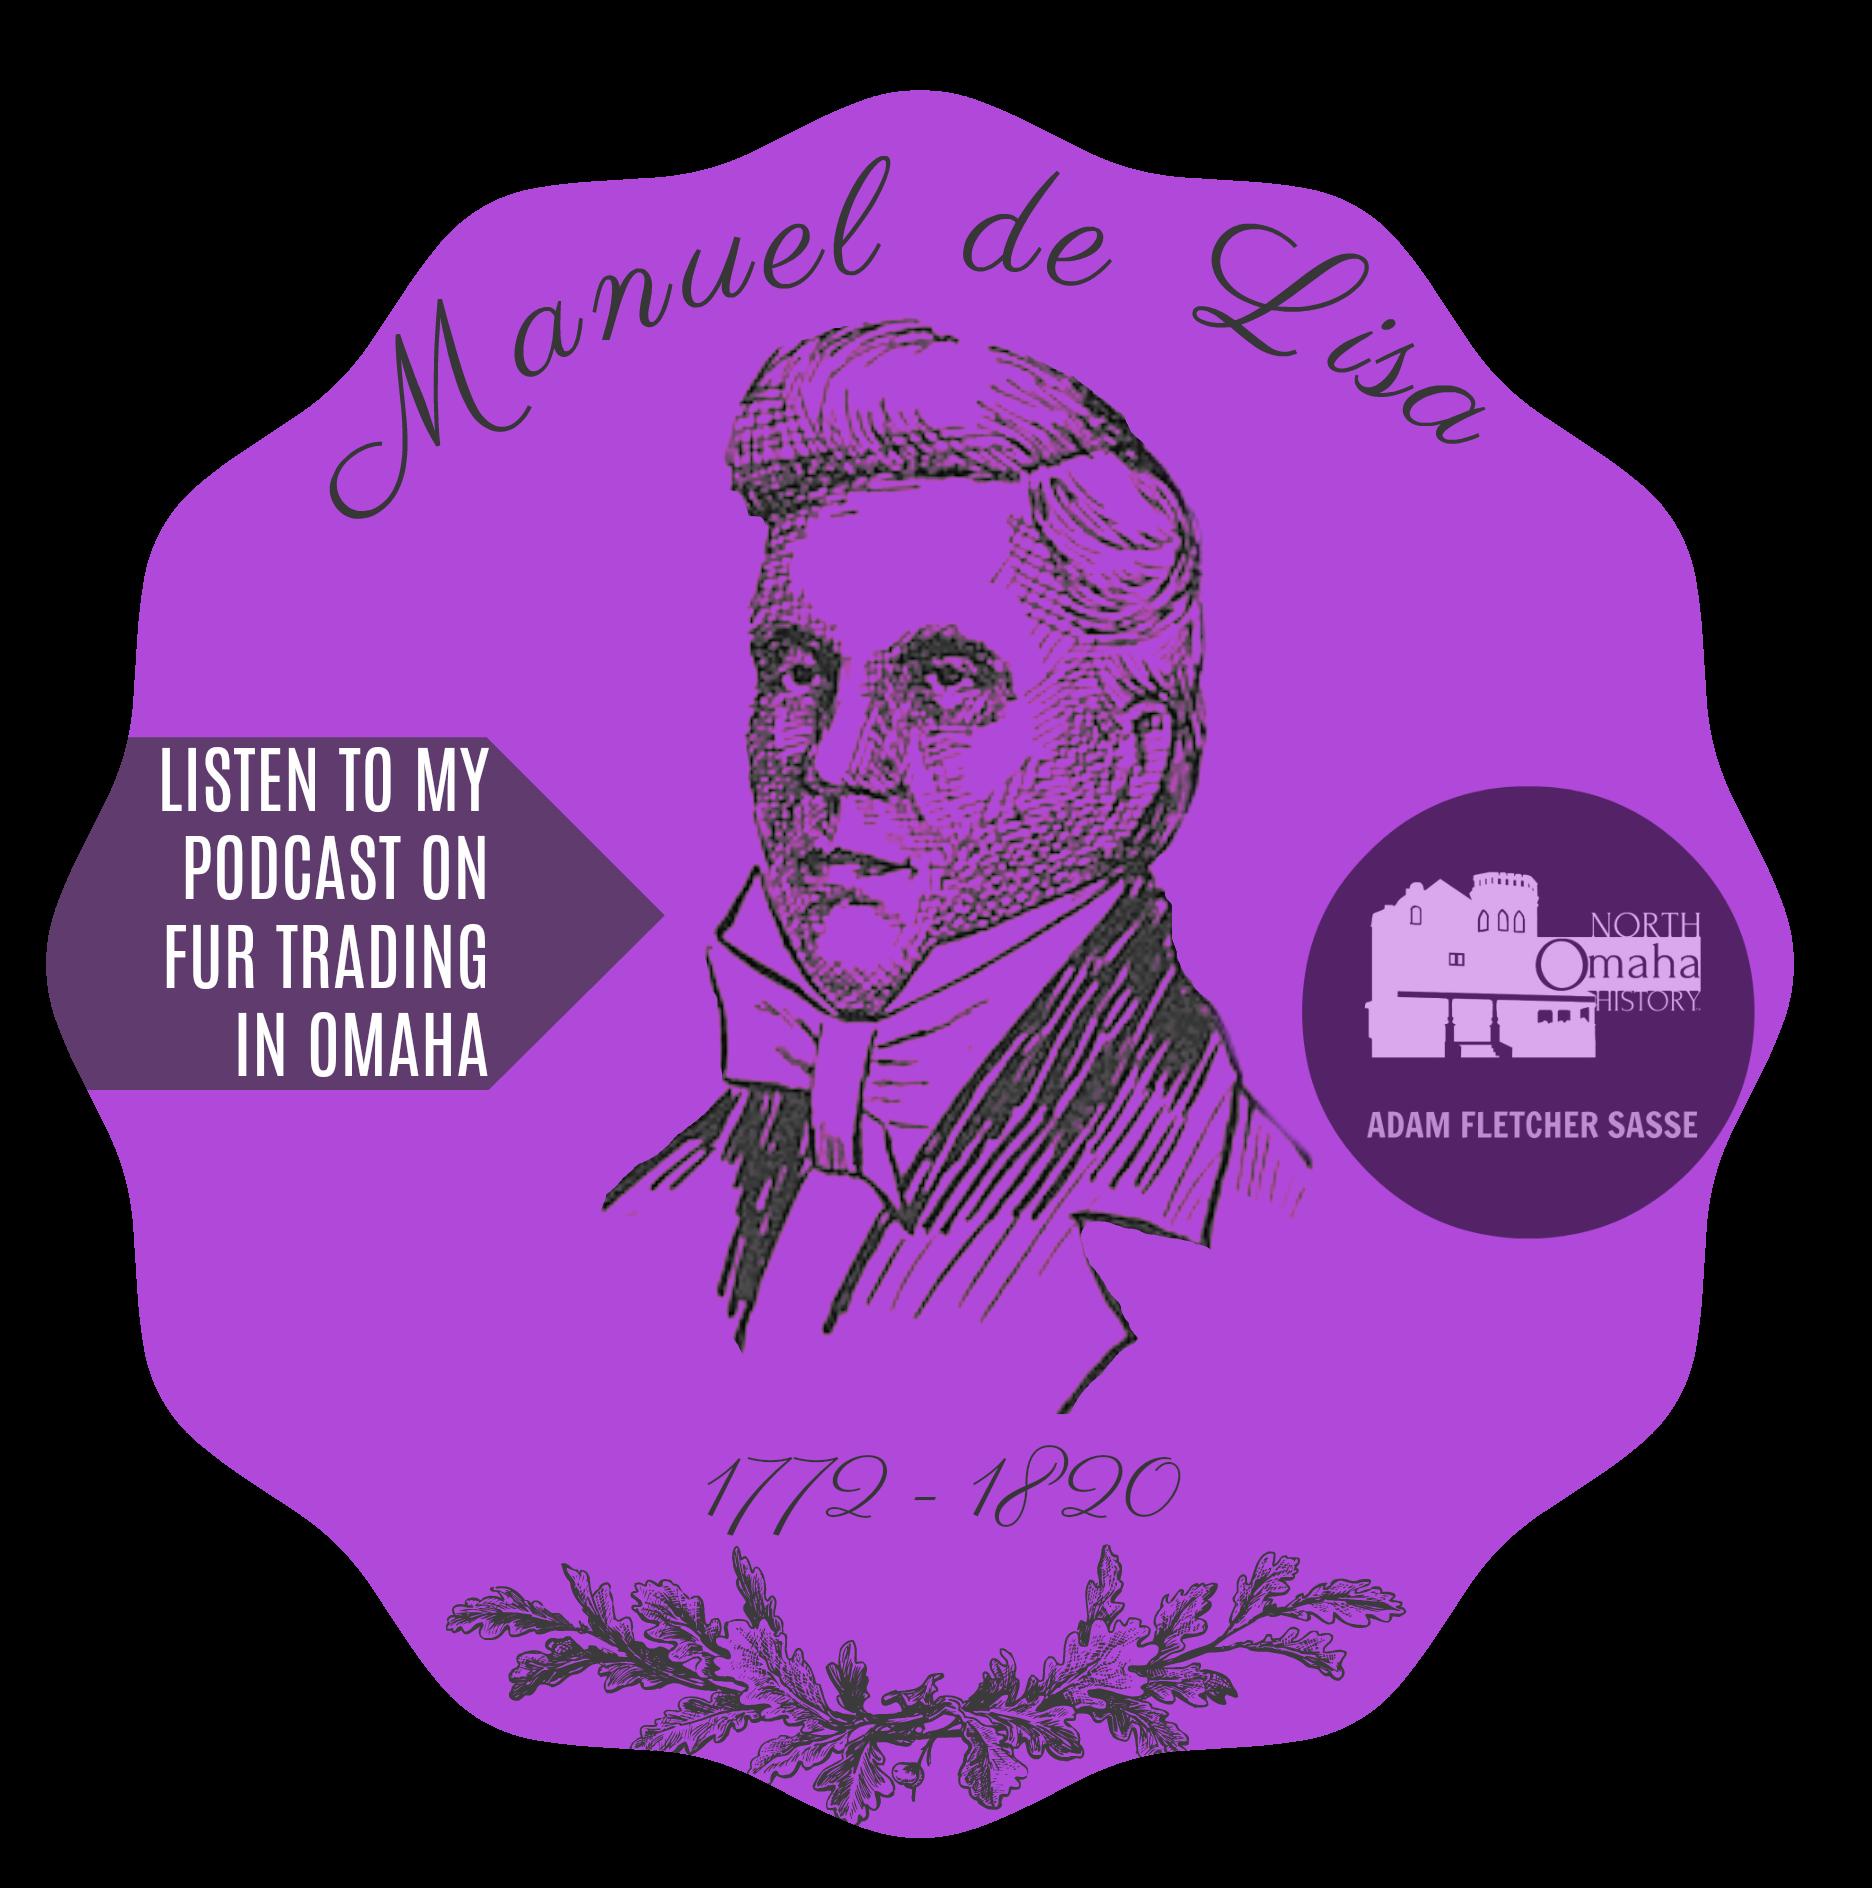 North Omaha History Podcast Show #1 on Fur Trading in Omaha, Nebraska